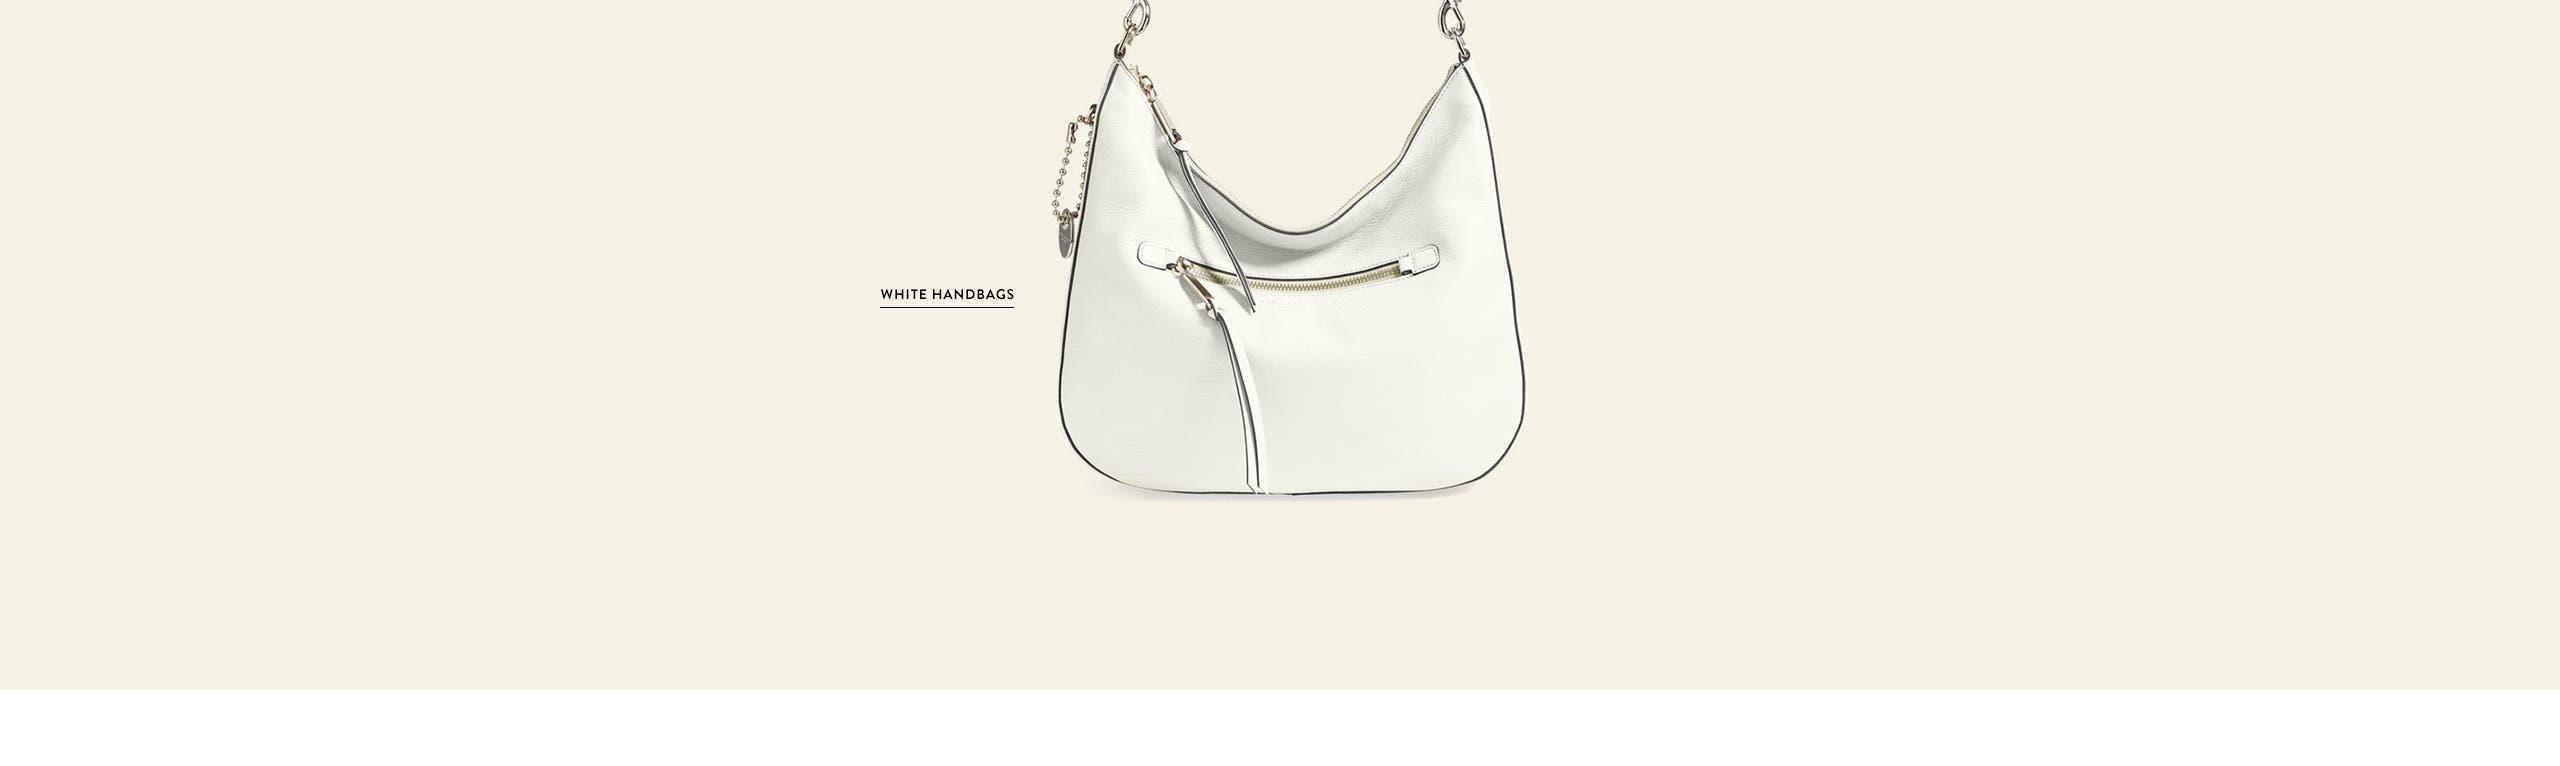 White handbags.